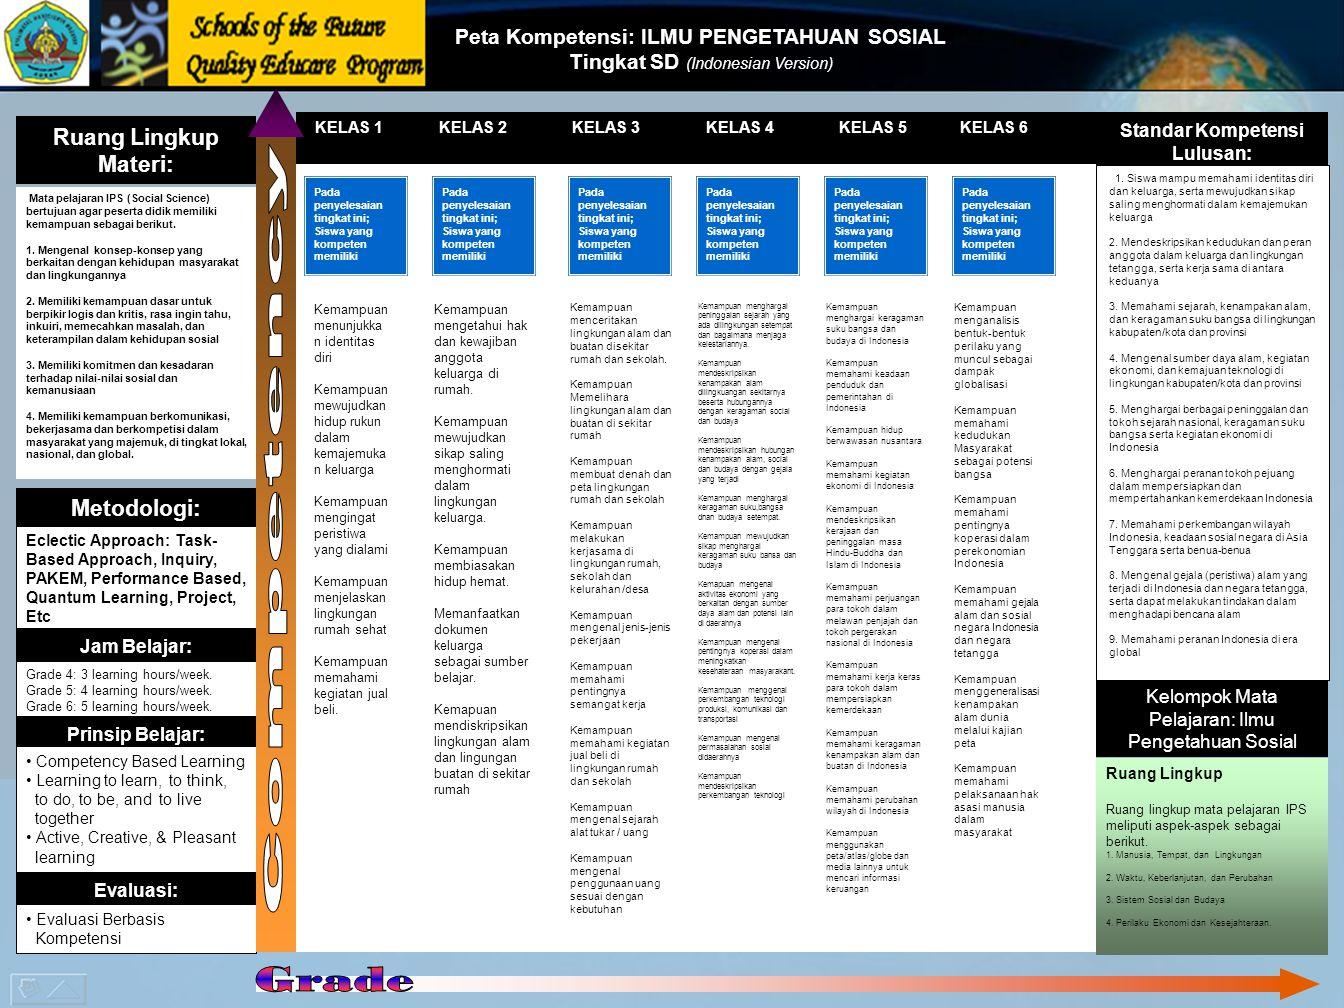 Peta Kompetensi: ILMU PENGETAHUAN SOSIAL Standar Kompetensi Lulusan: